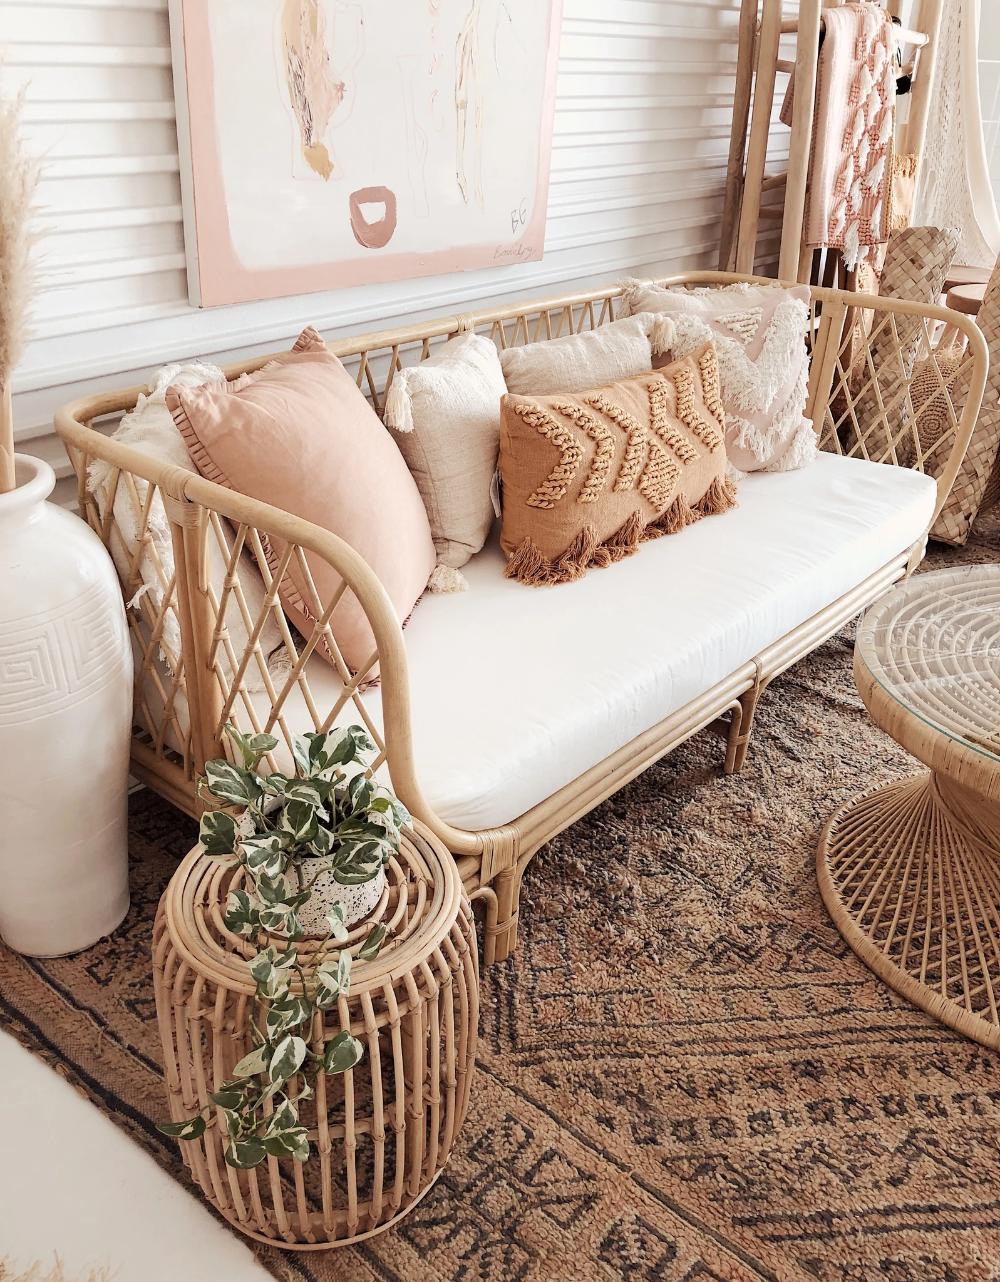 Halcyon sofa  Boho chic living room, Boho living room, Chic